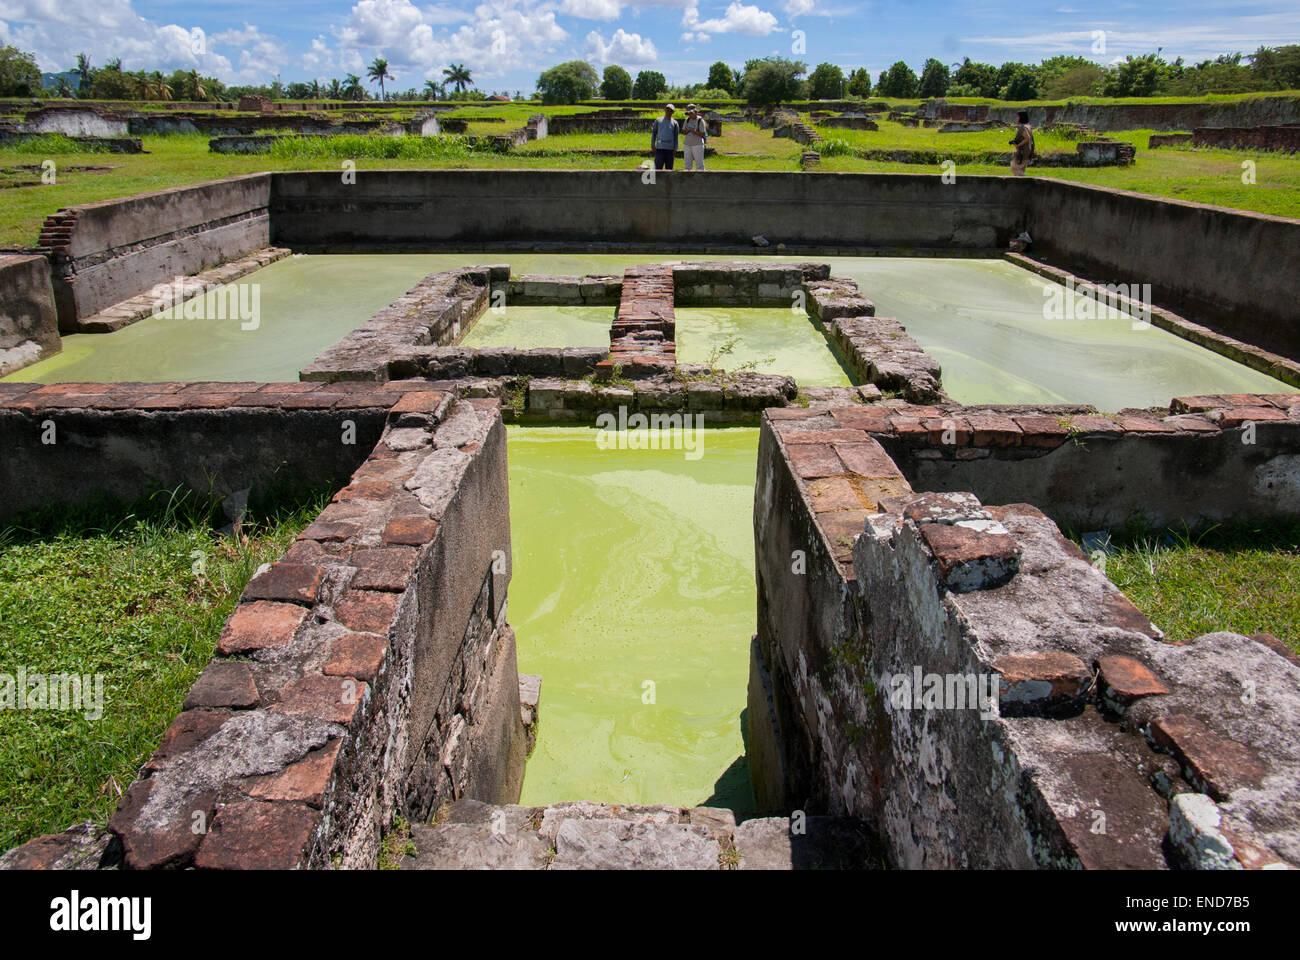 Ruins of royal pond at Surosowan palace, Old Banten, Java, Indonesia. Stock Photo